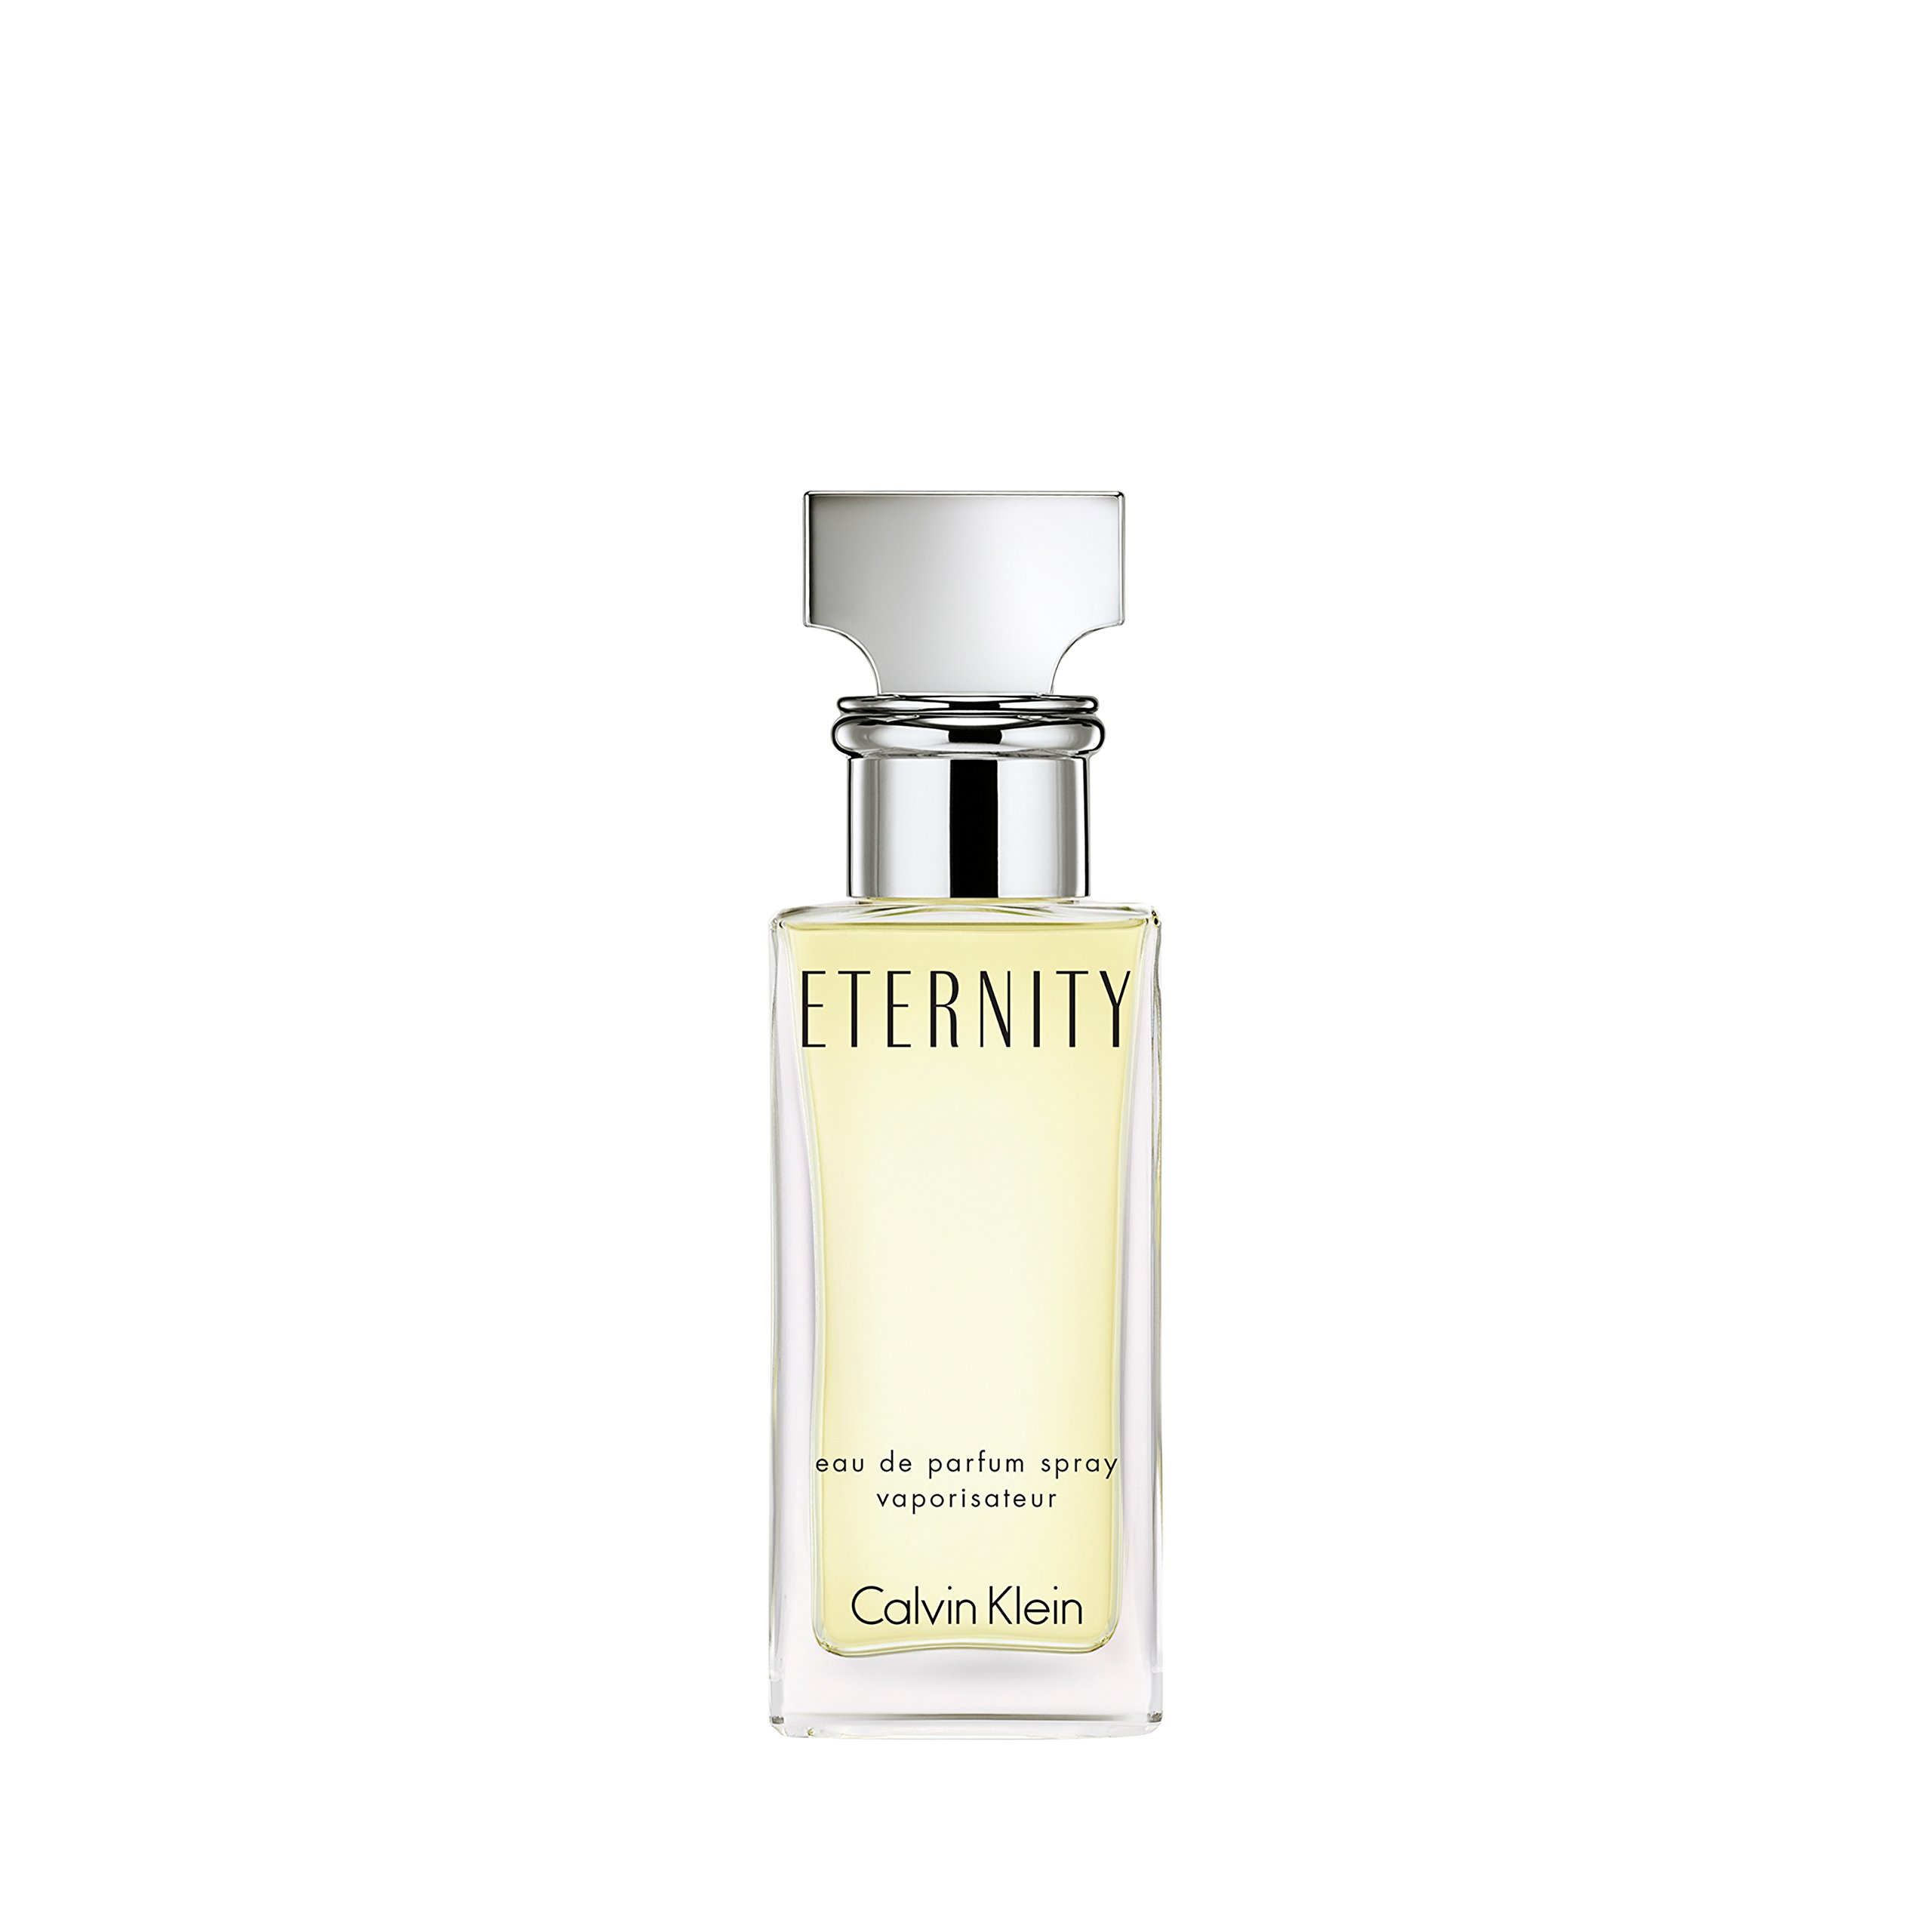 31b8a58c6fd8 Best Rated in Women s Eau de Perfume   Helpful Customer Reviews ...